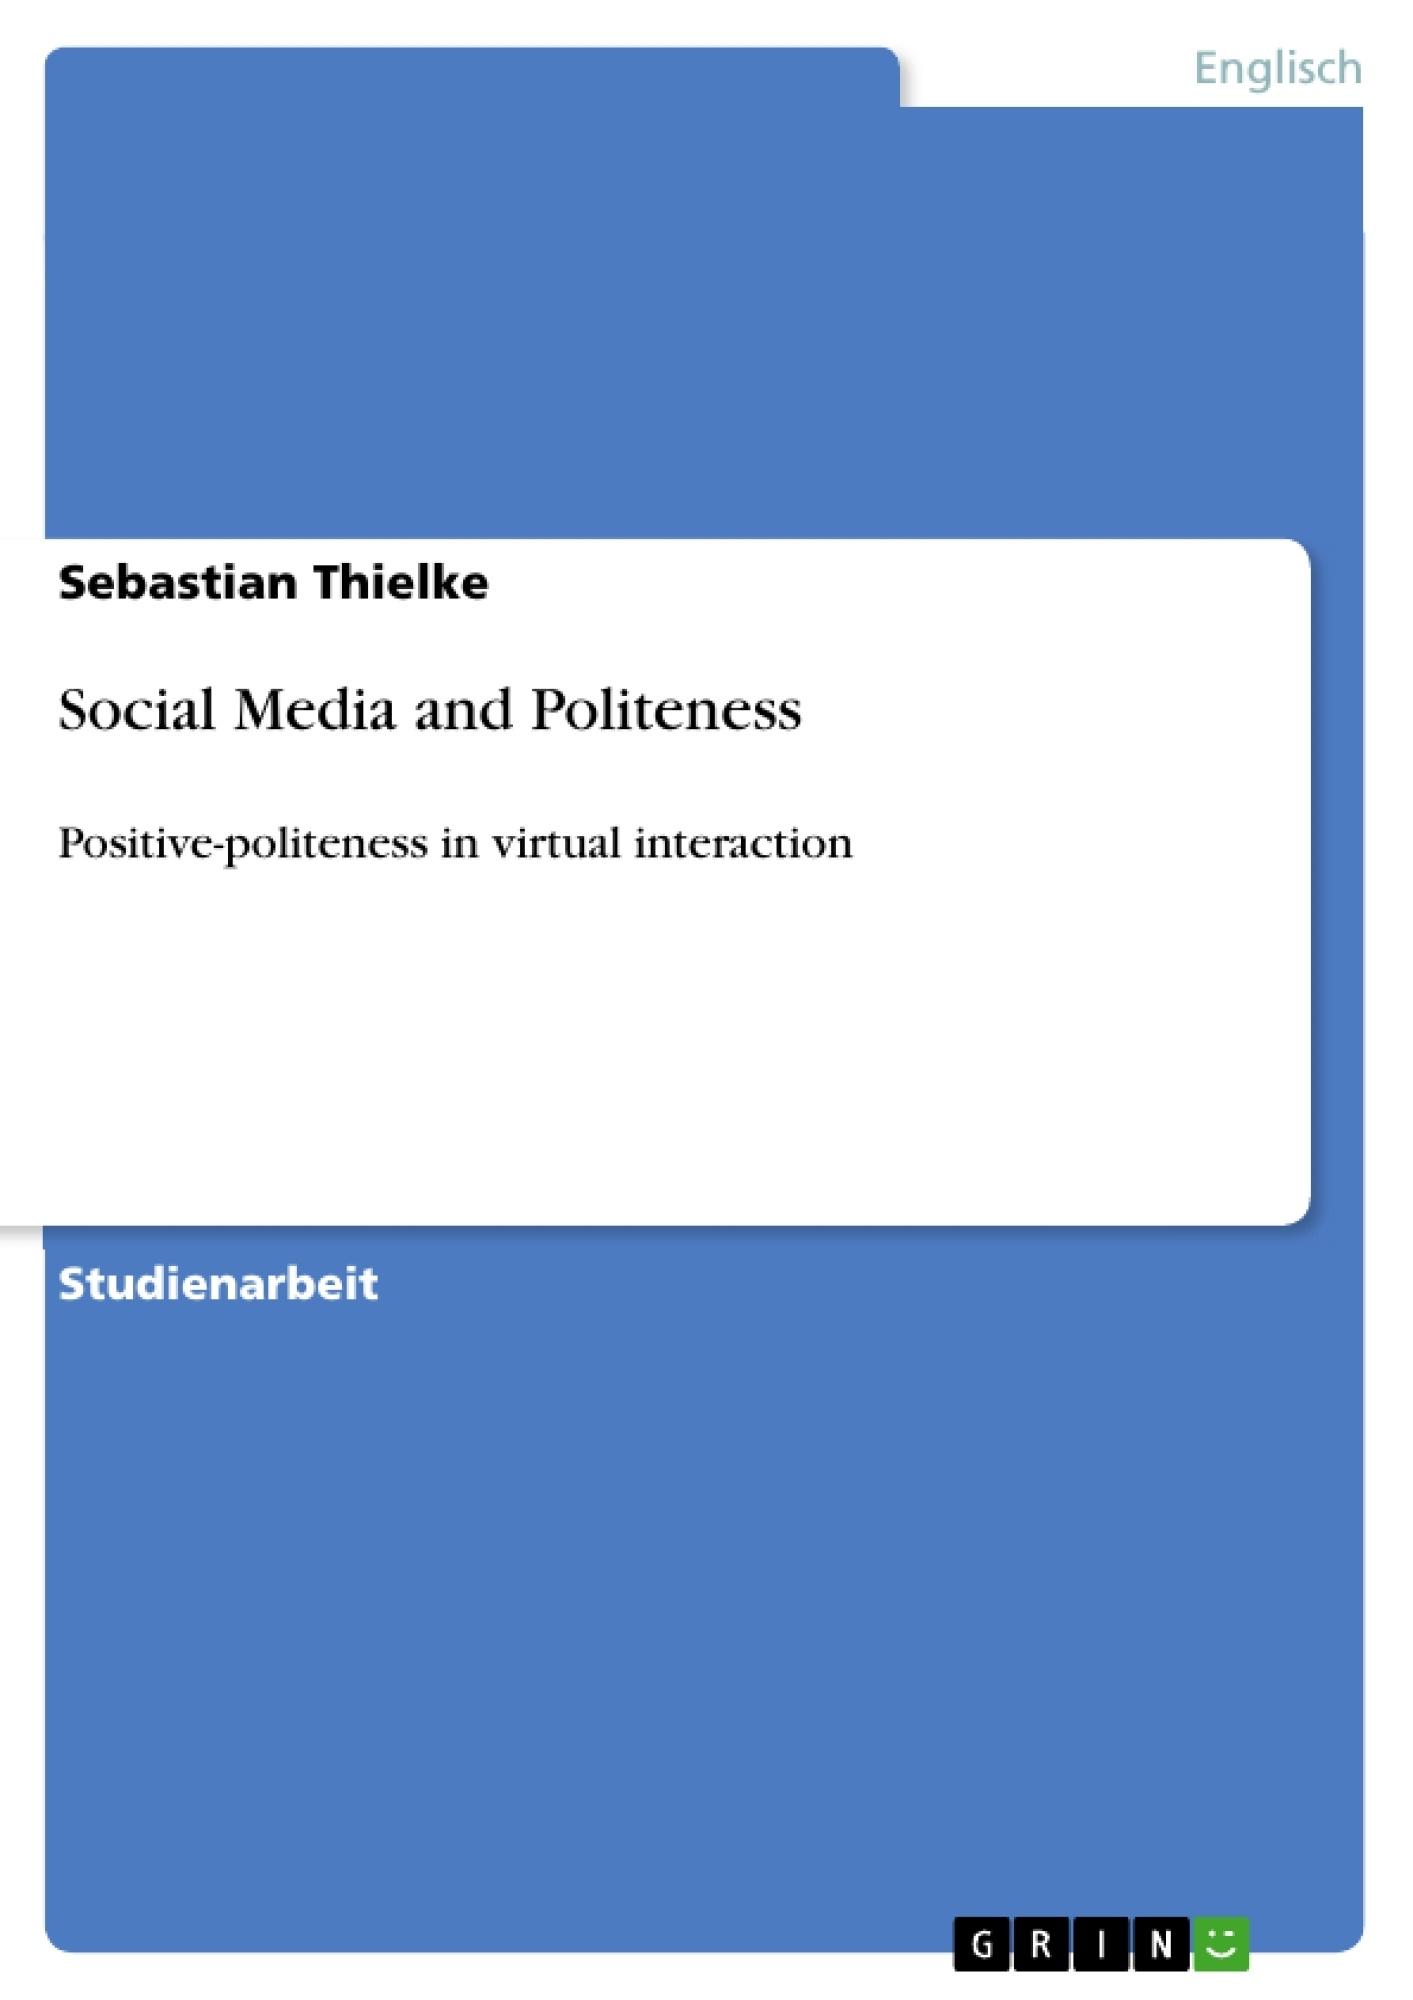 Titel: Social Media and Politeness